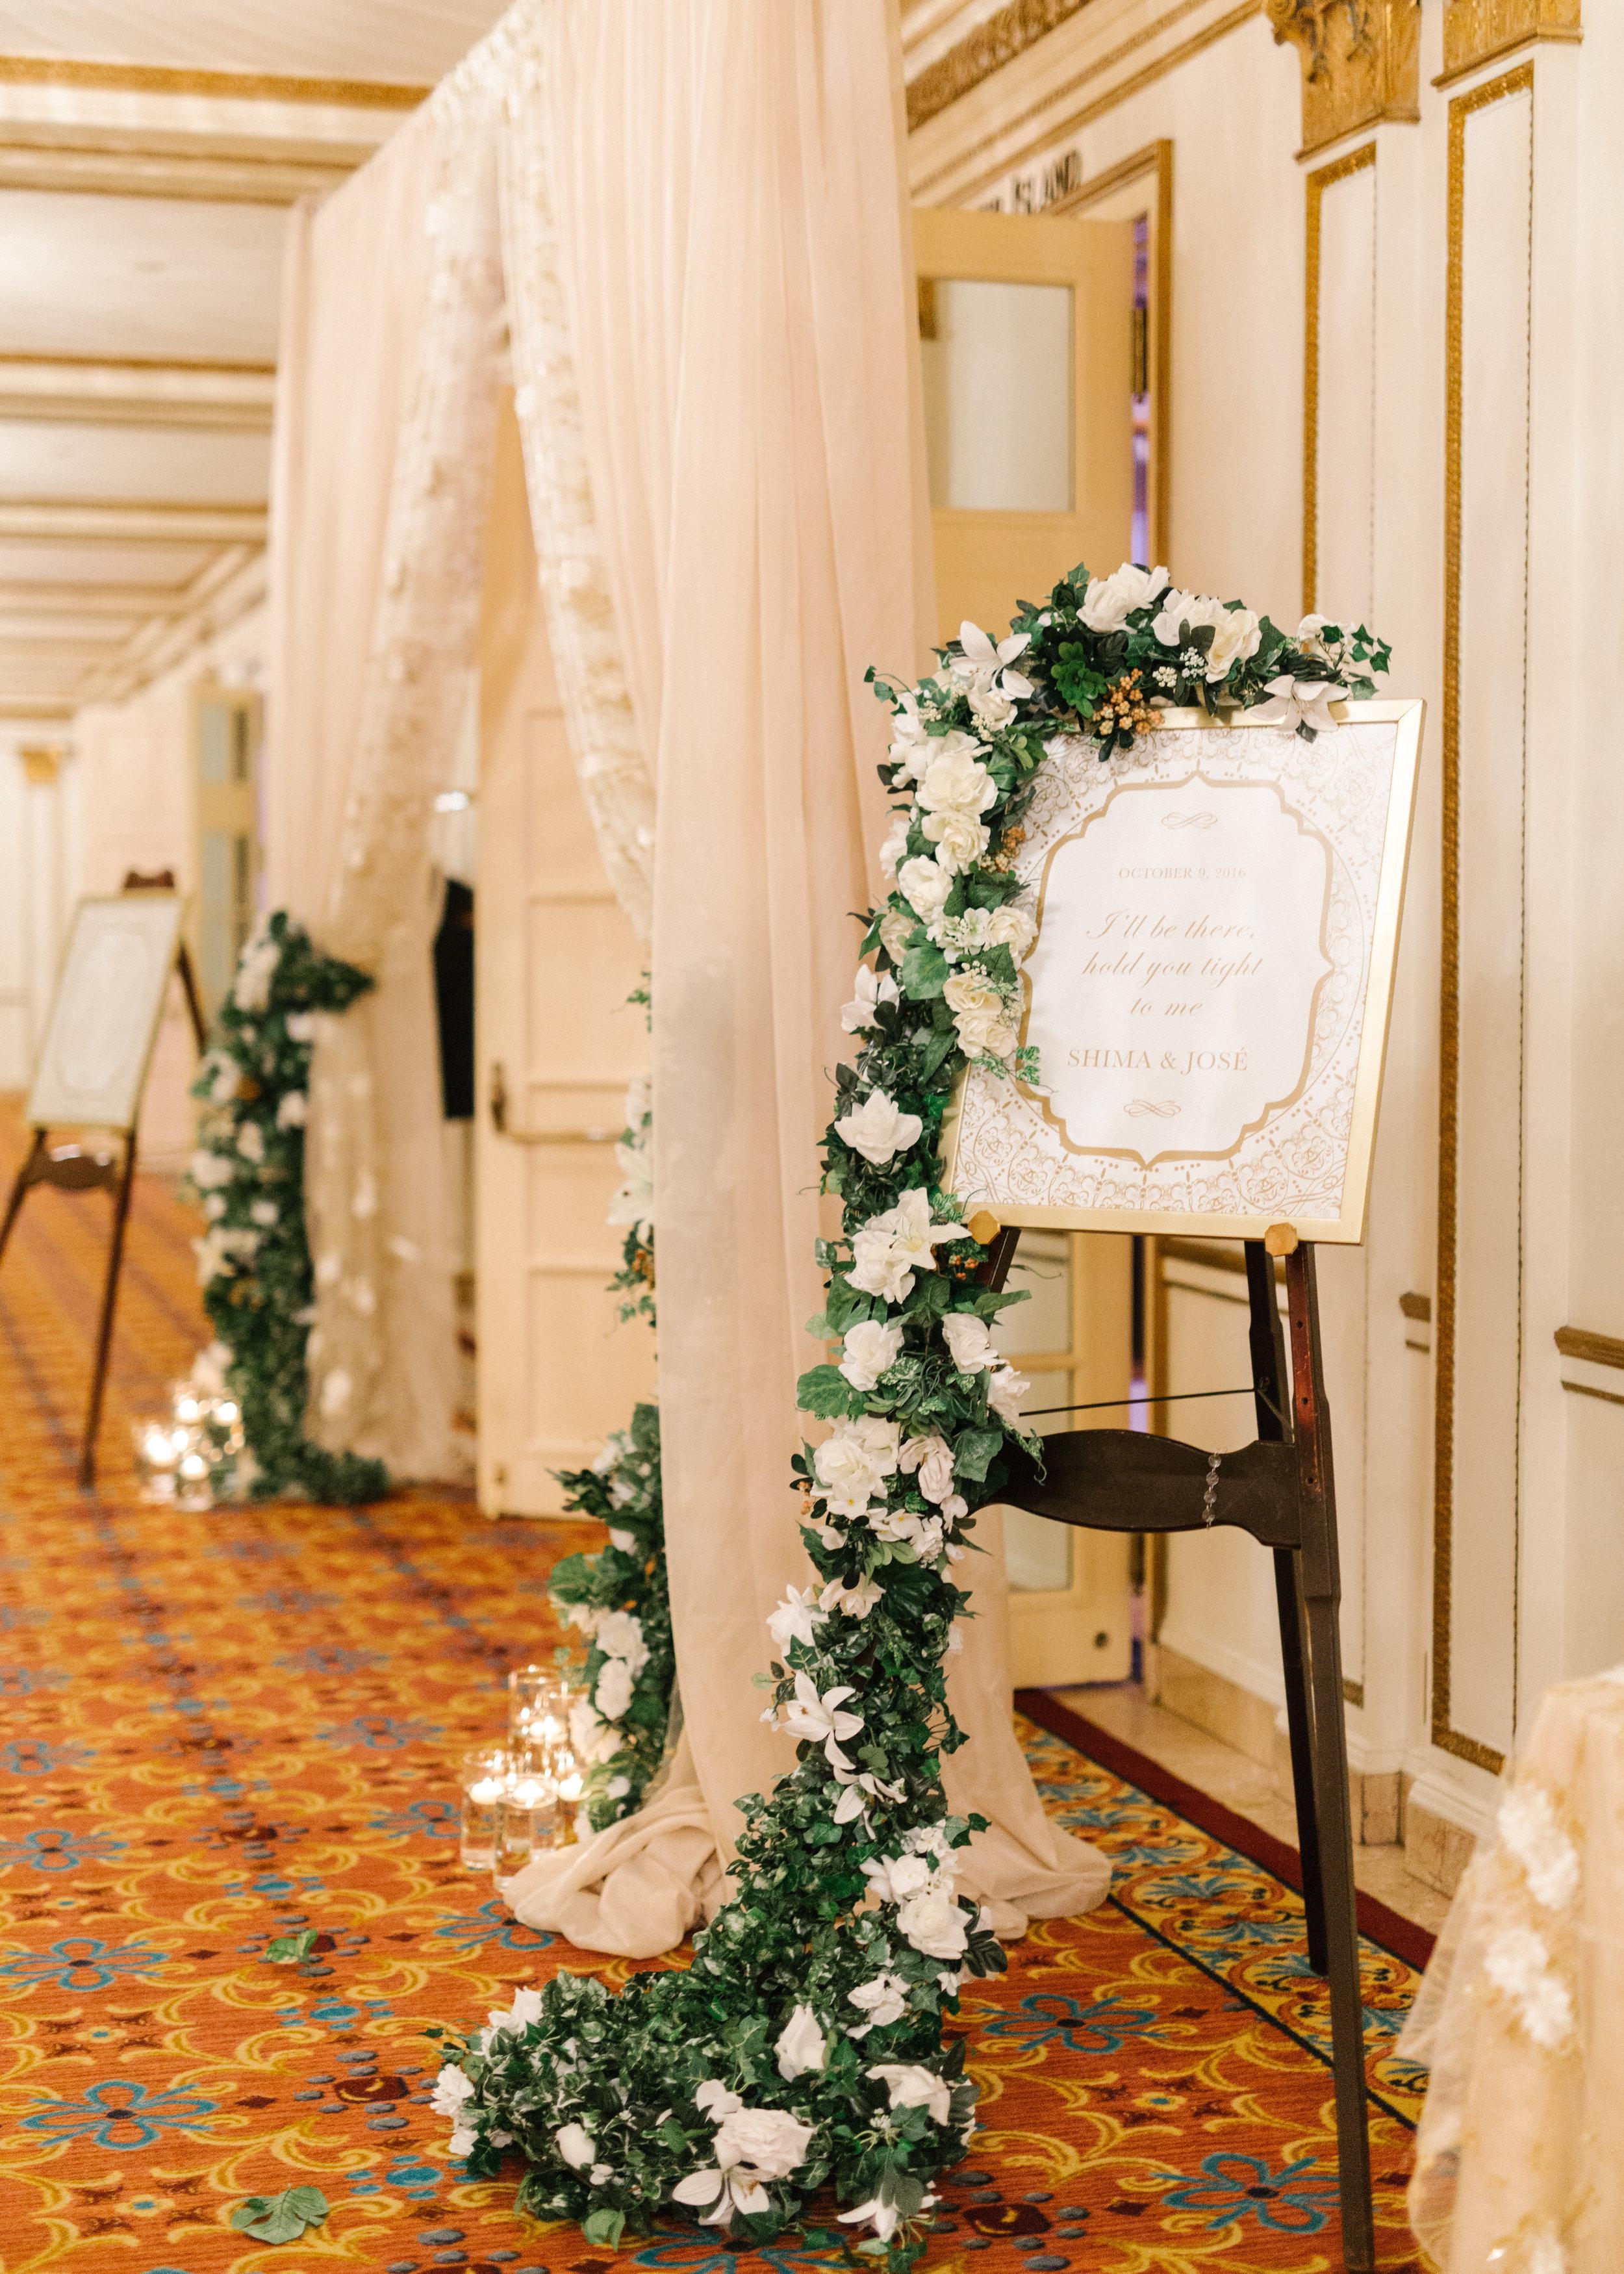 herafilms_wedding_shima_jose_collectors_package-370.jpg